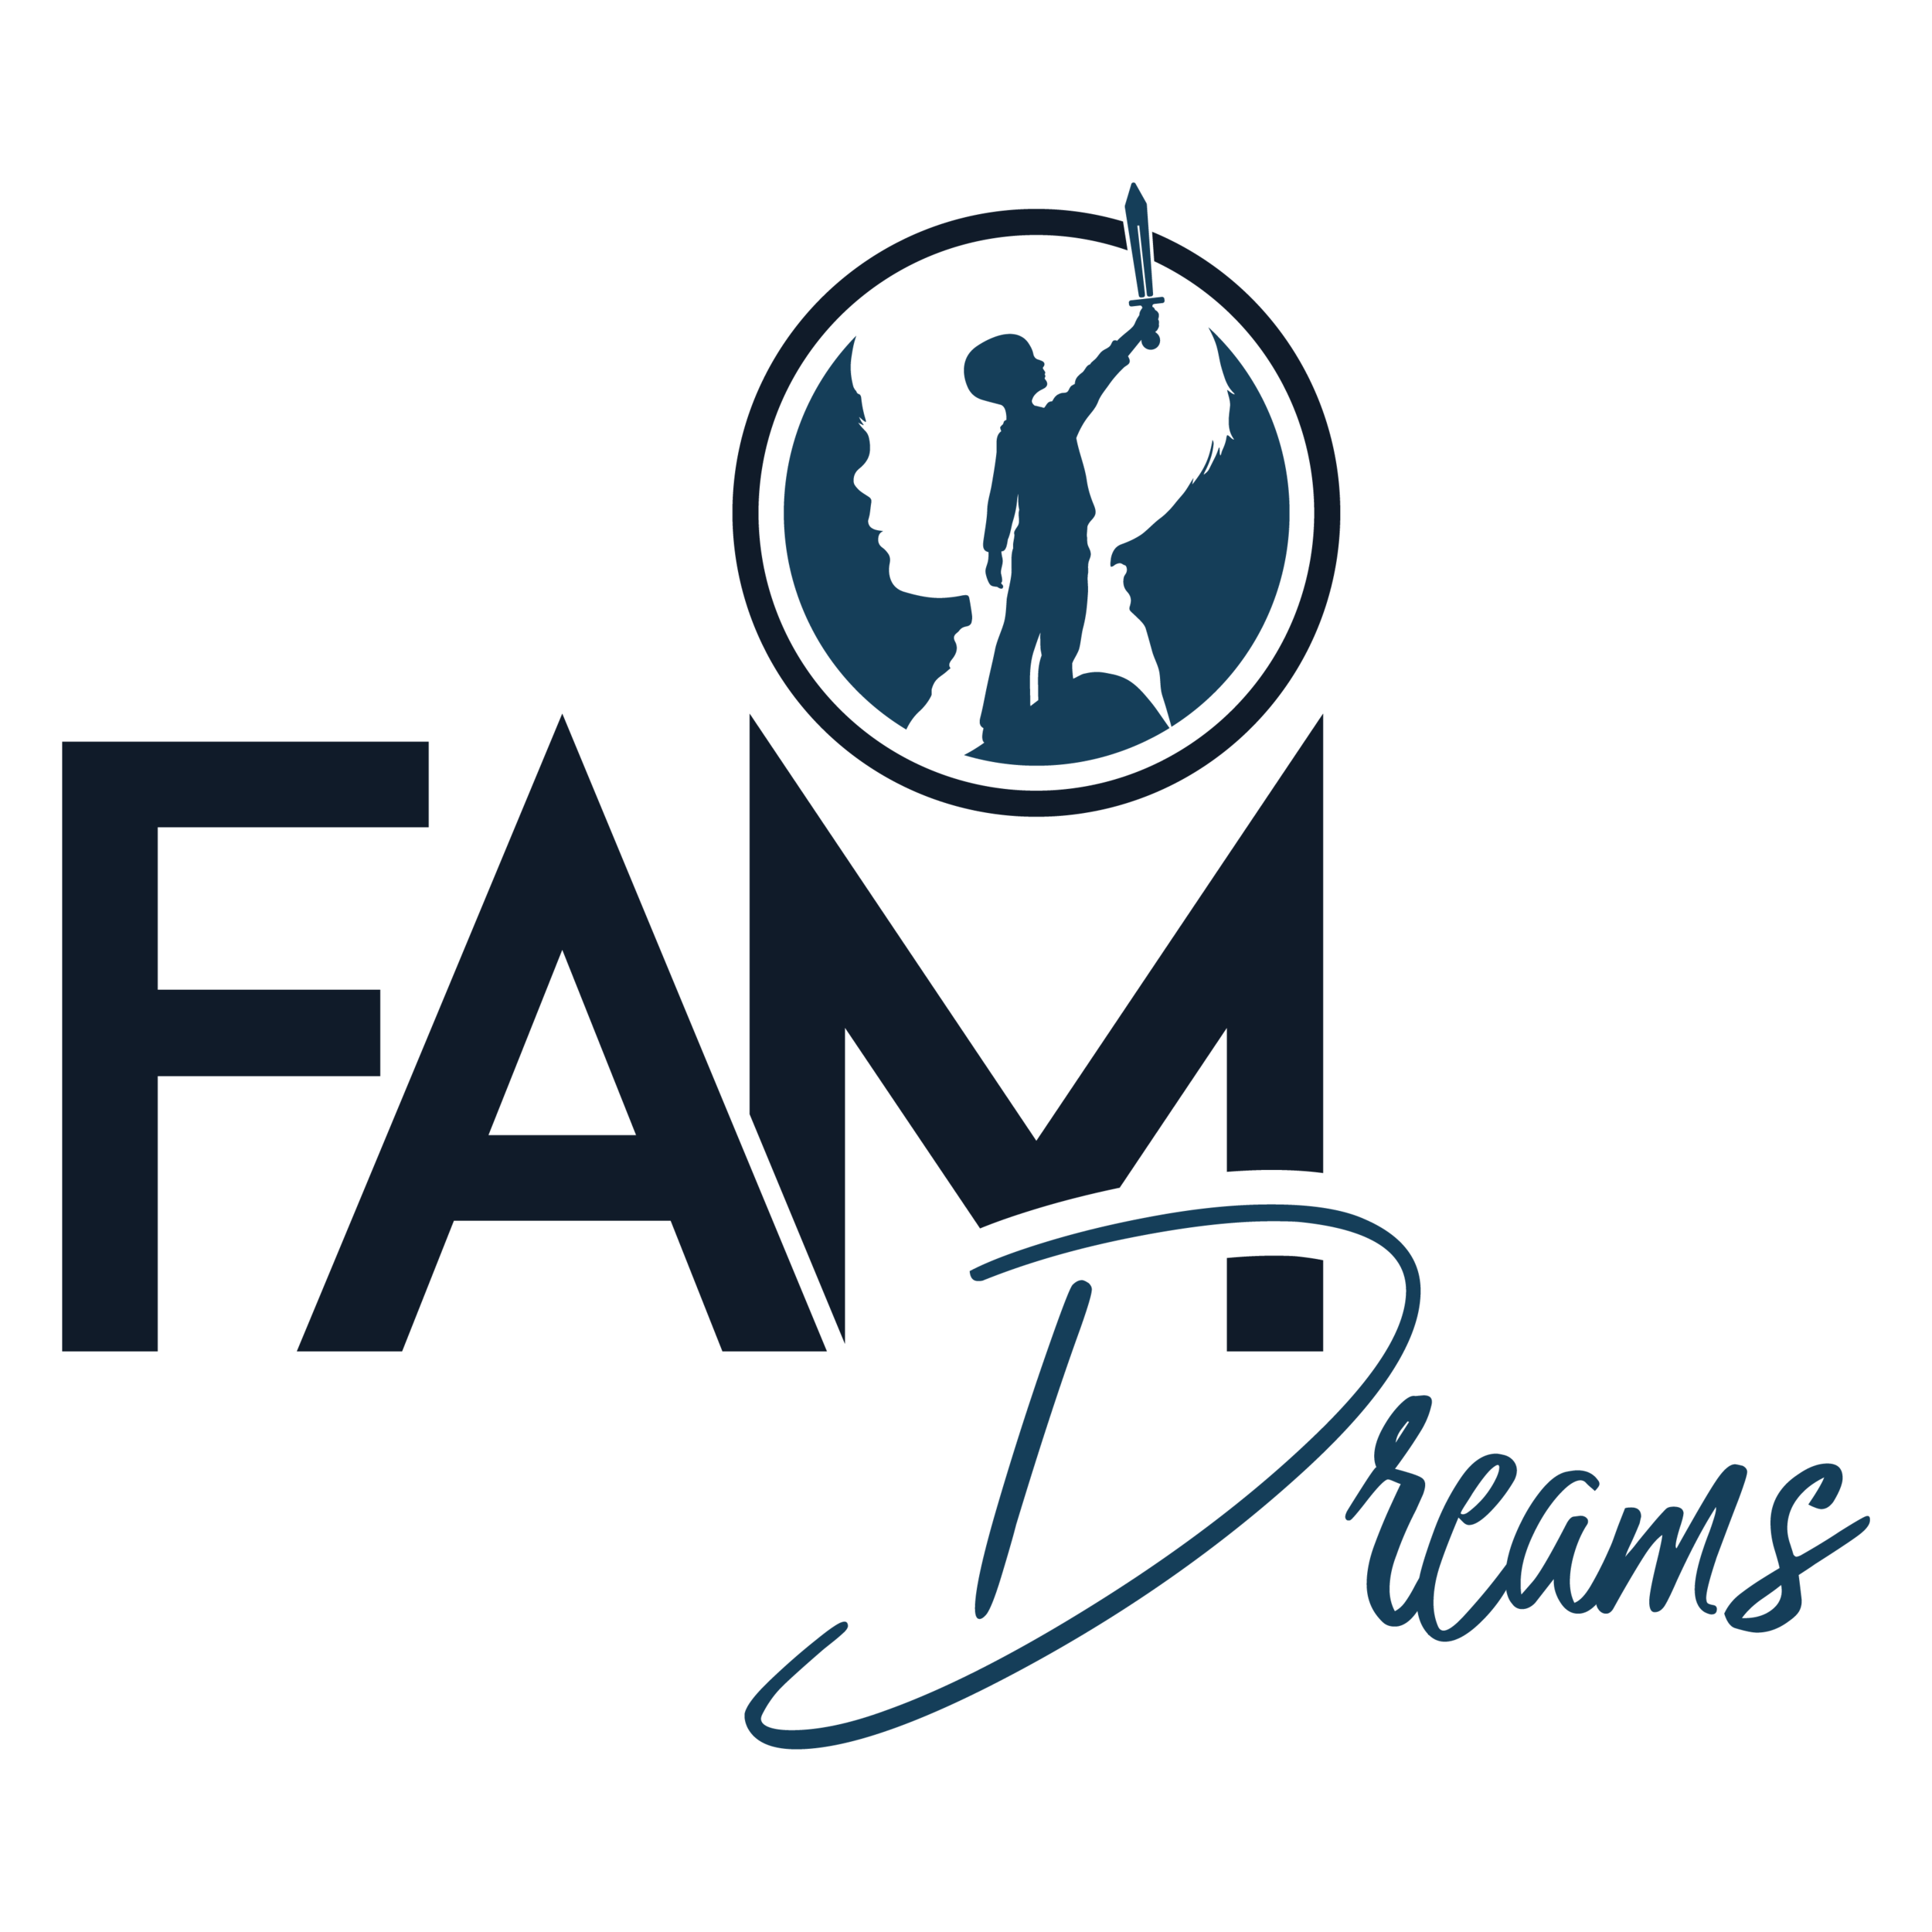 FAM_SERVICE_Logos_2019-06.png